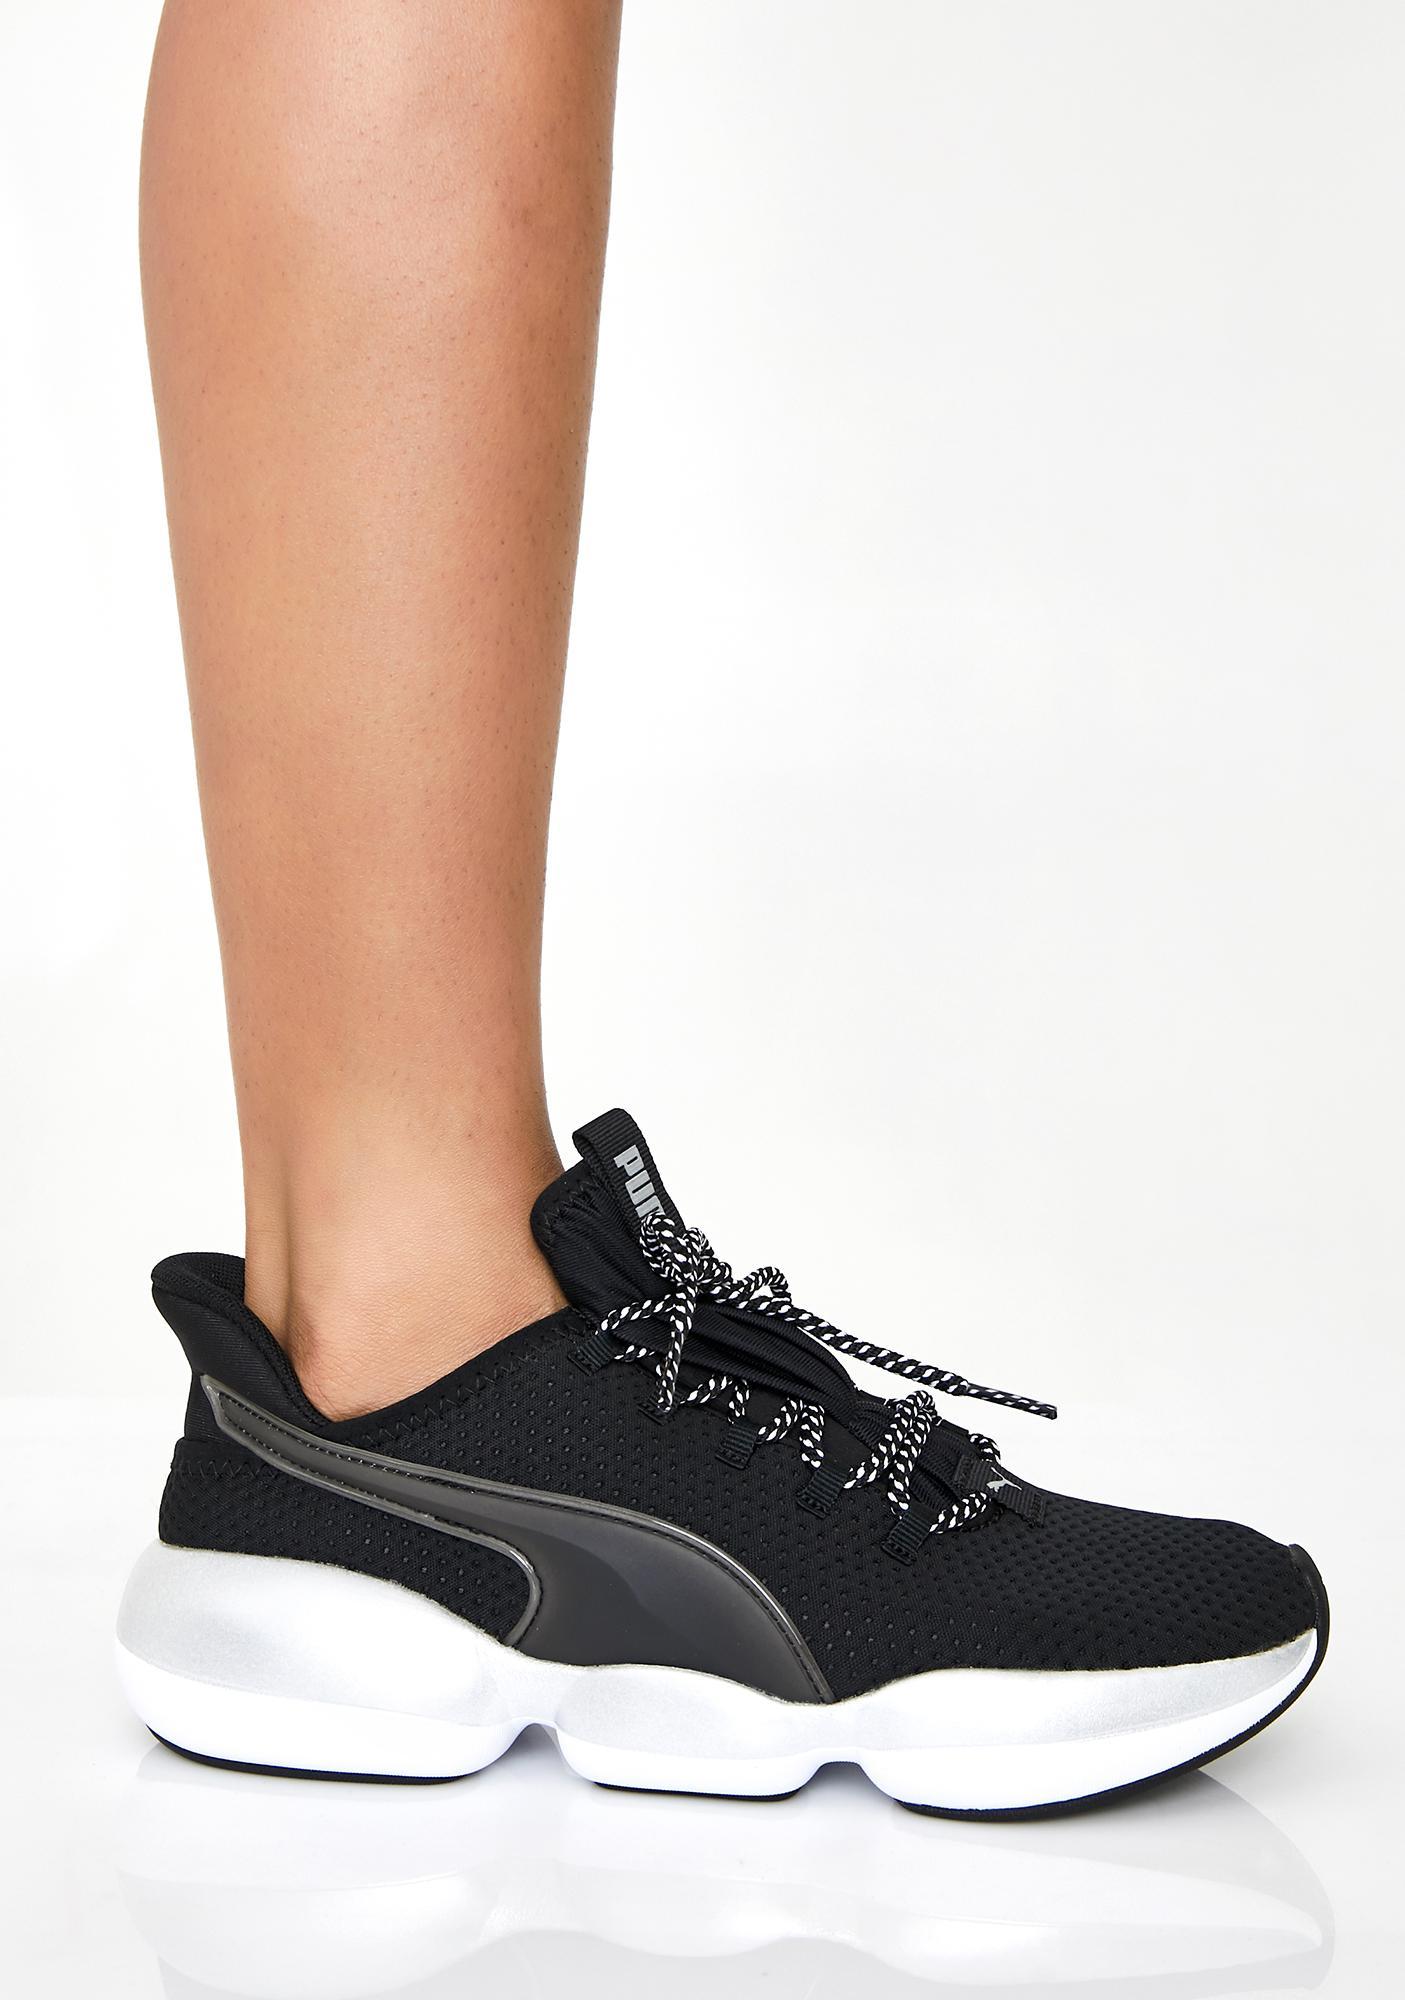 PUMA Mode Xt Training Athletic Sneakers